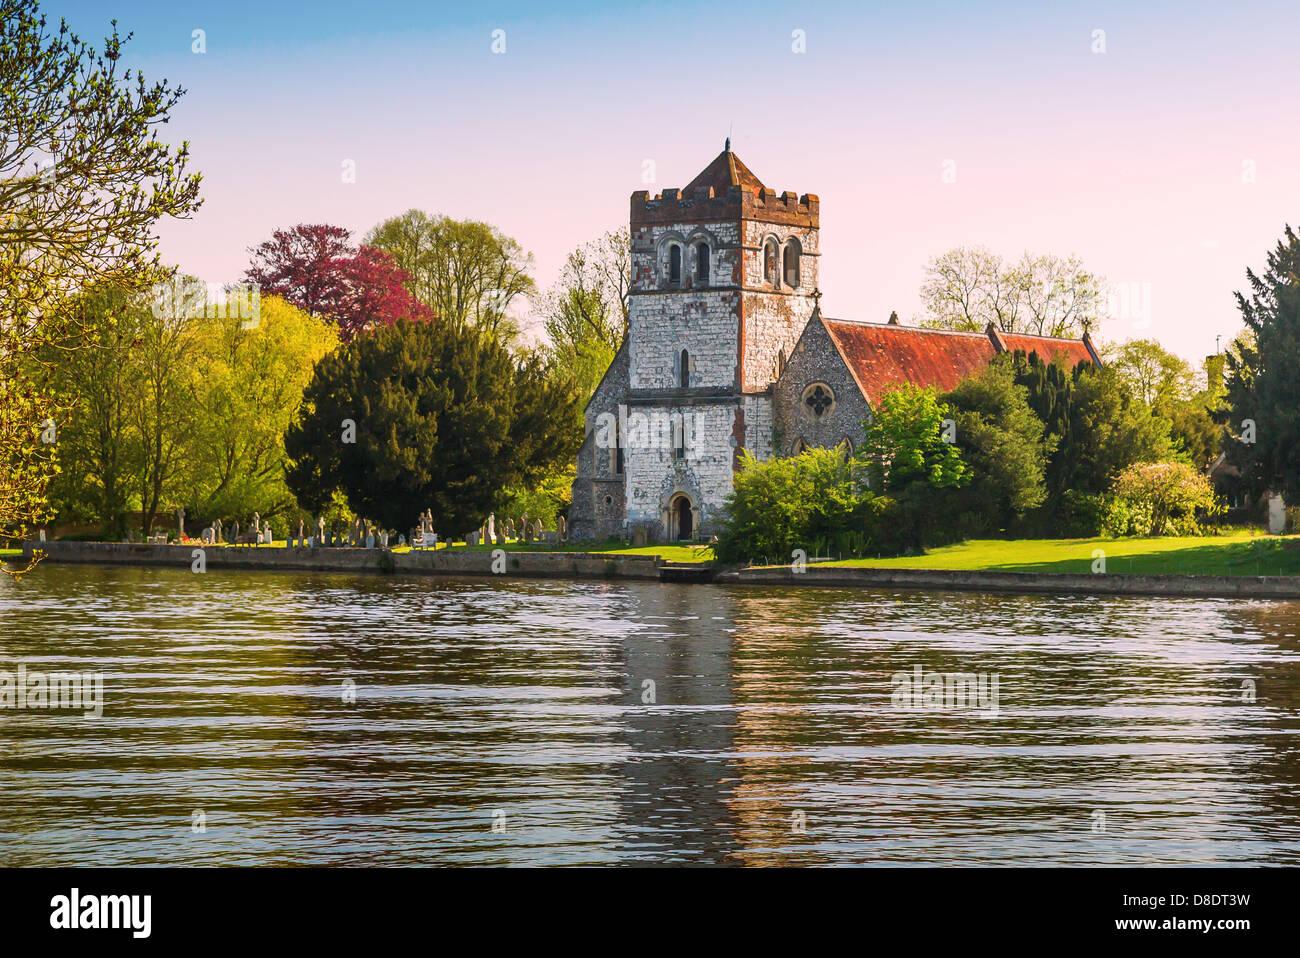 All Saints Church Bisham across the River Thames, Marlow, Buckinghamshire, UK, England - Stock Image